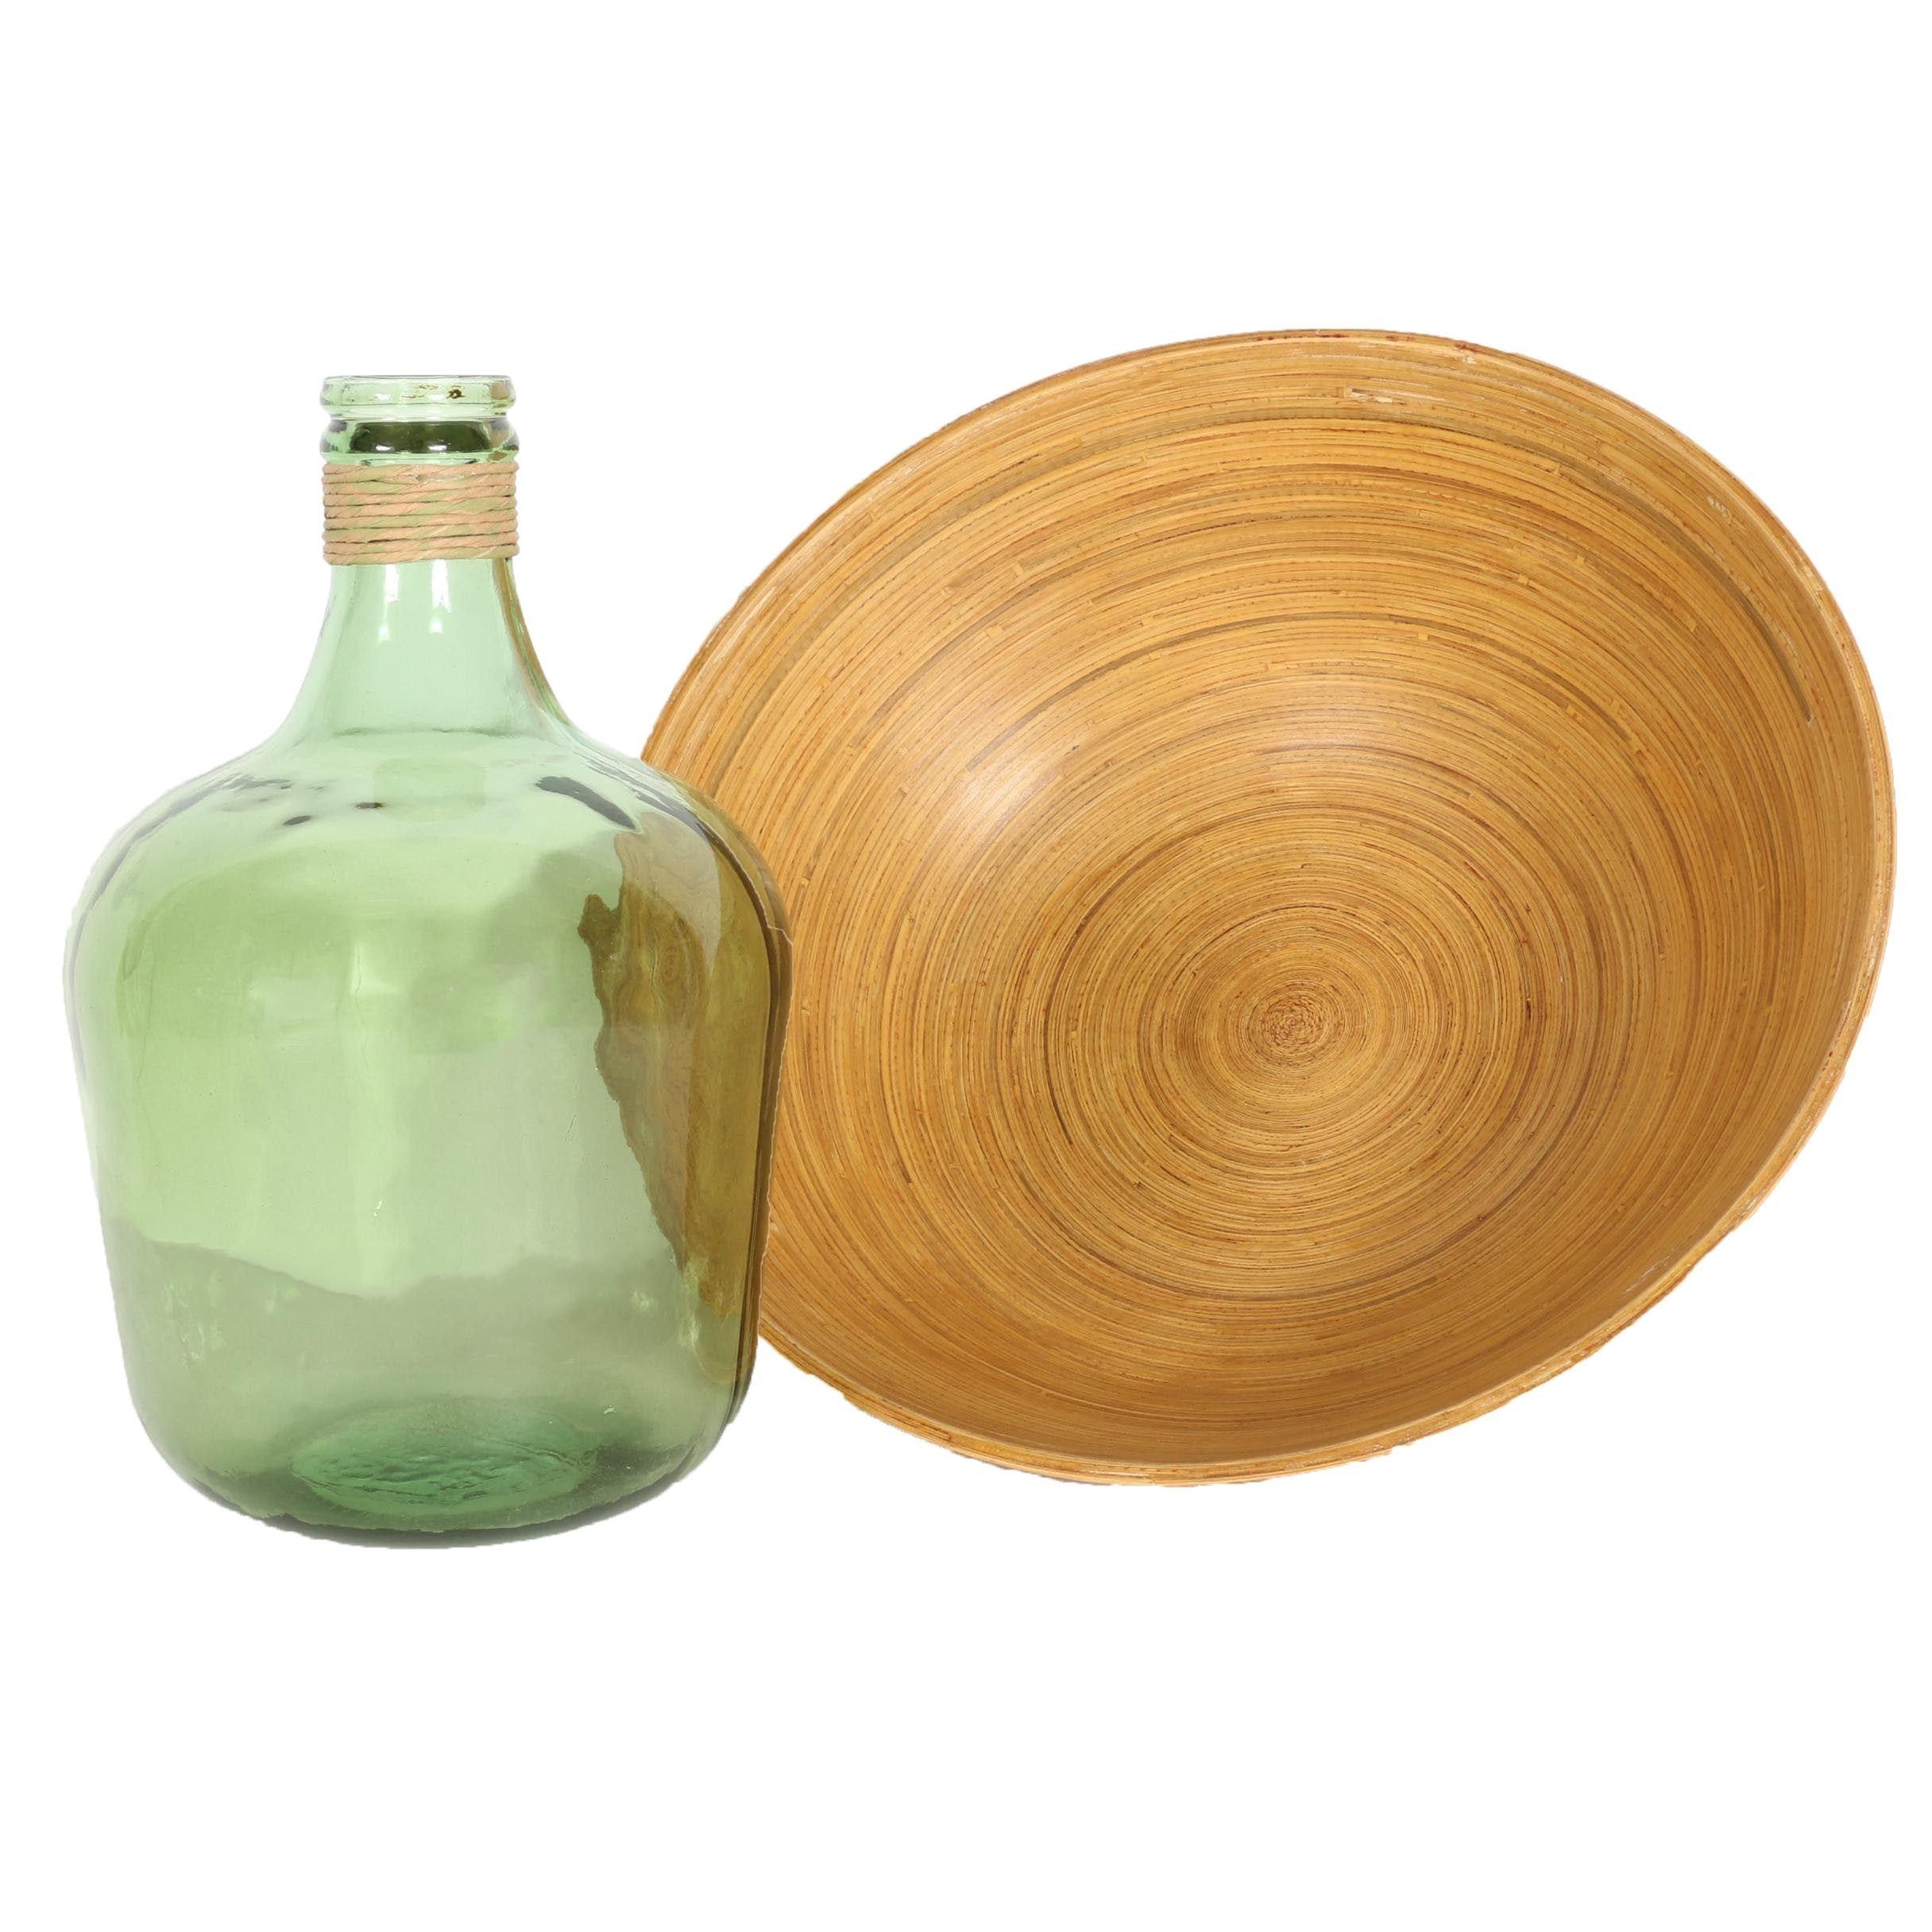 Glass IMAX Jug and Bamboo Bowl